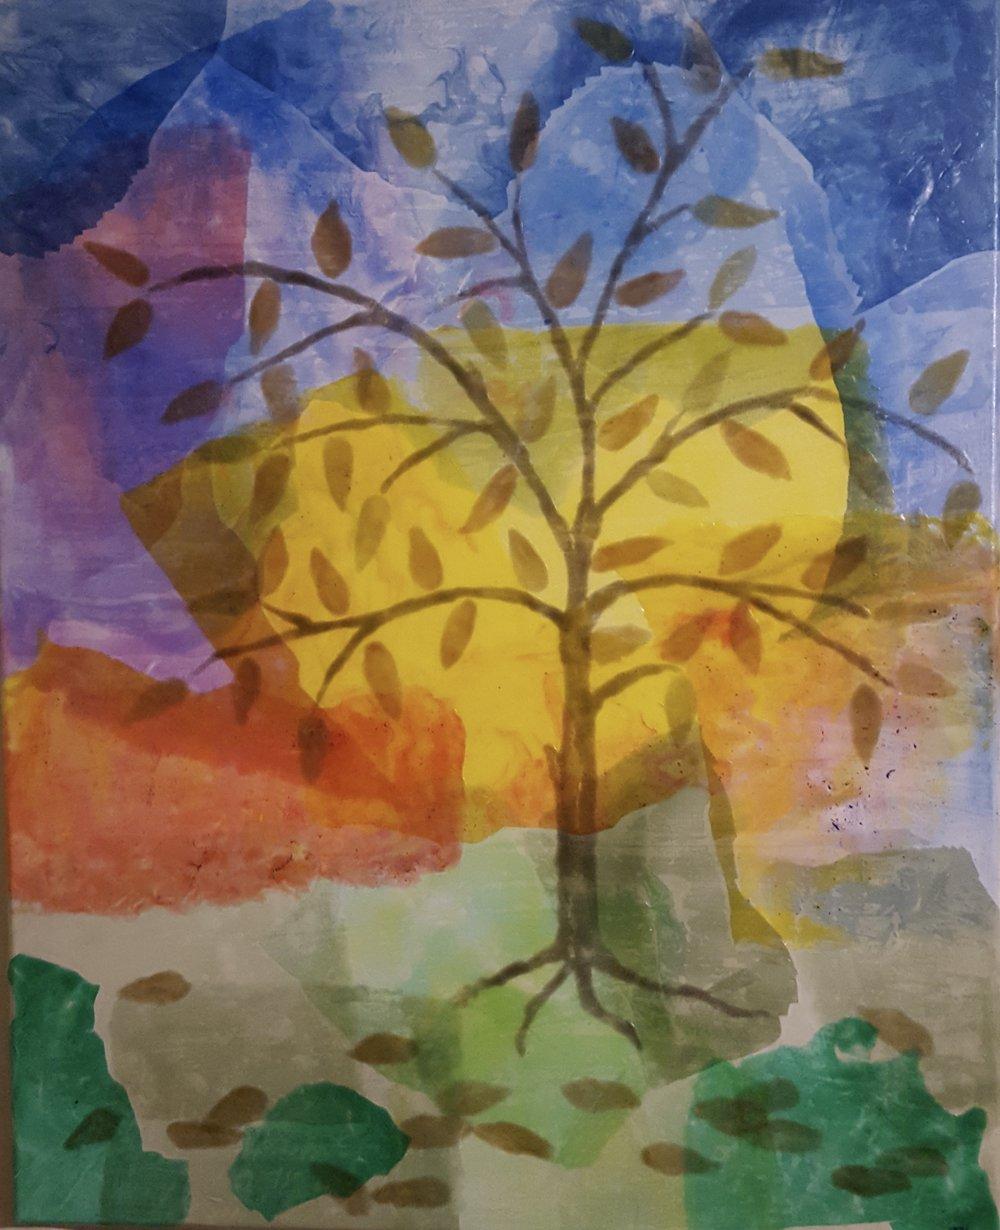 Painting by Teri Hatley